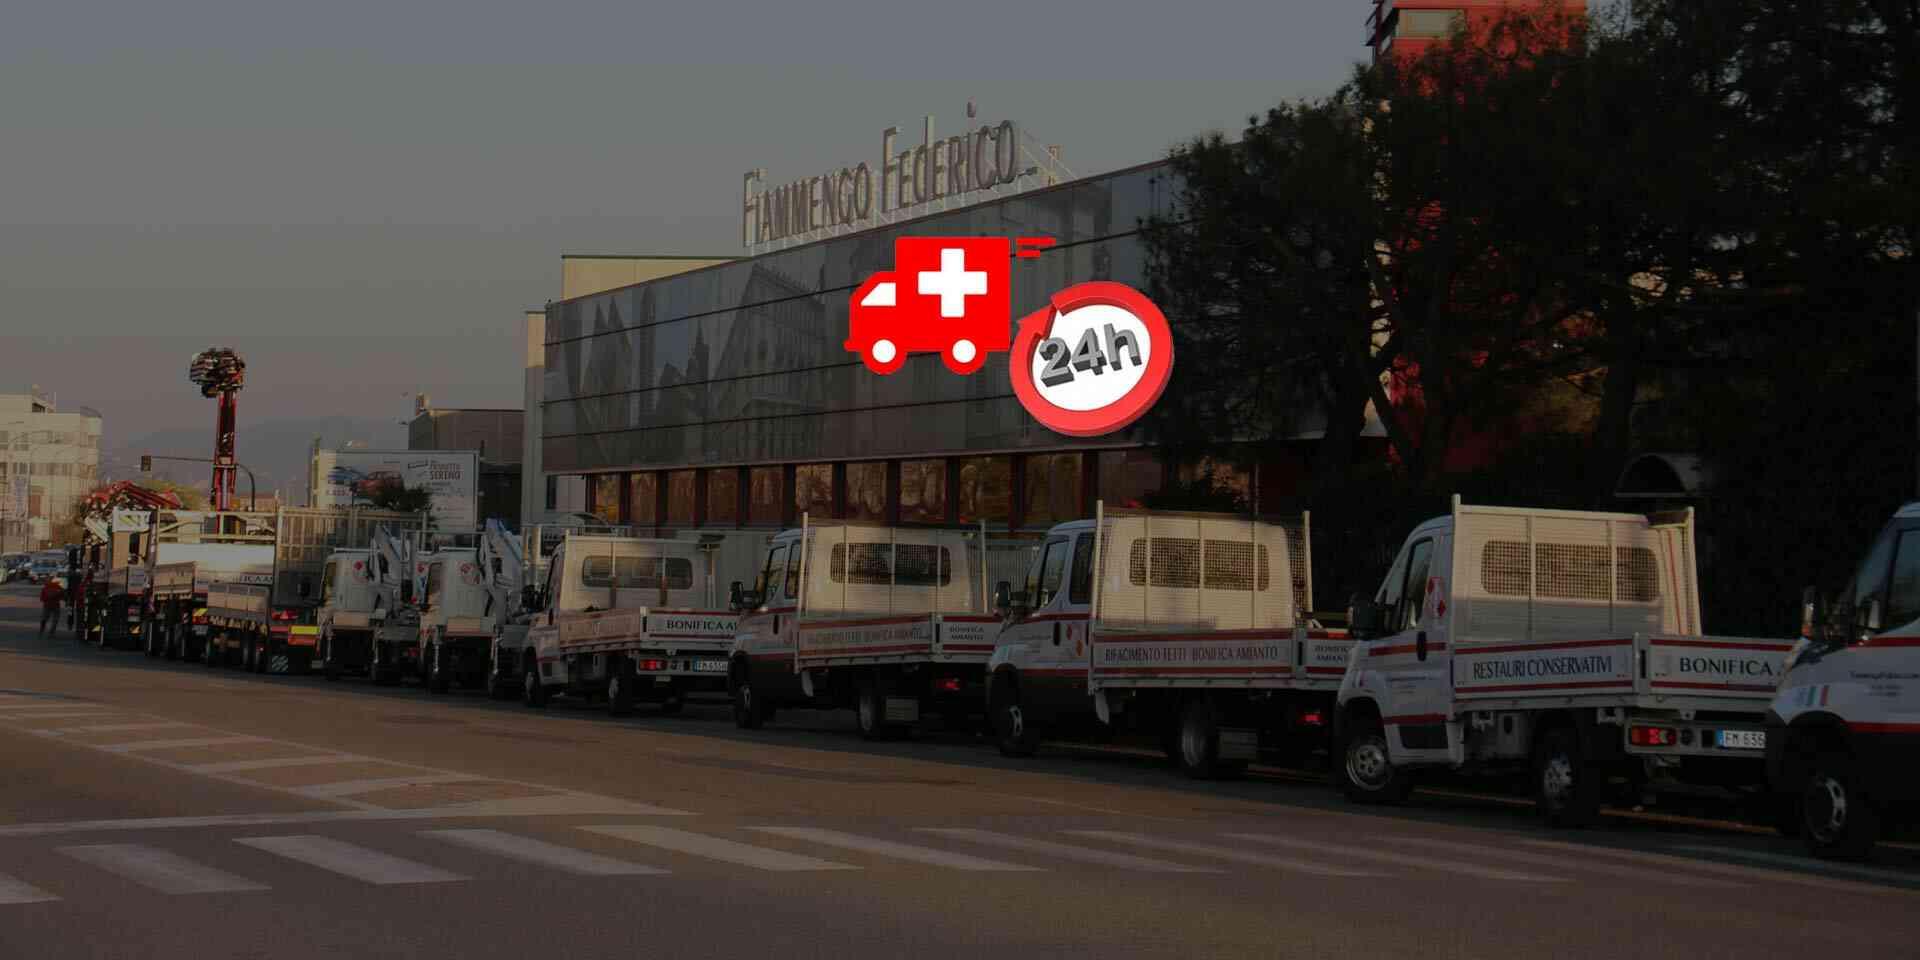 interventi di urgenza in 24 ore